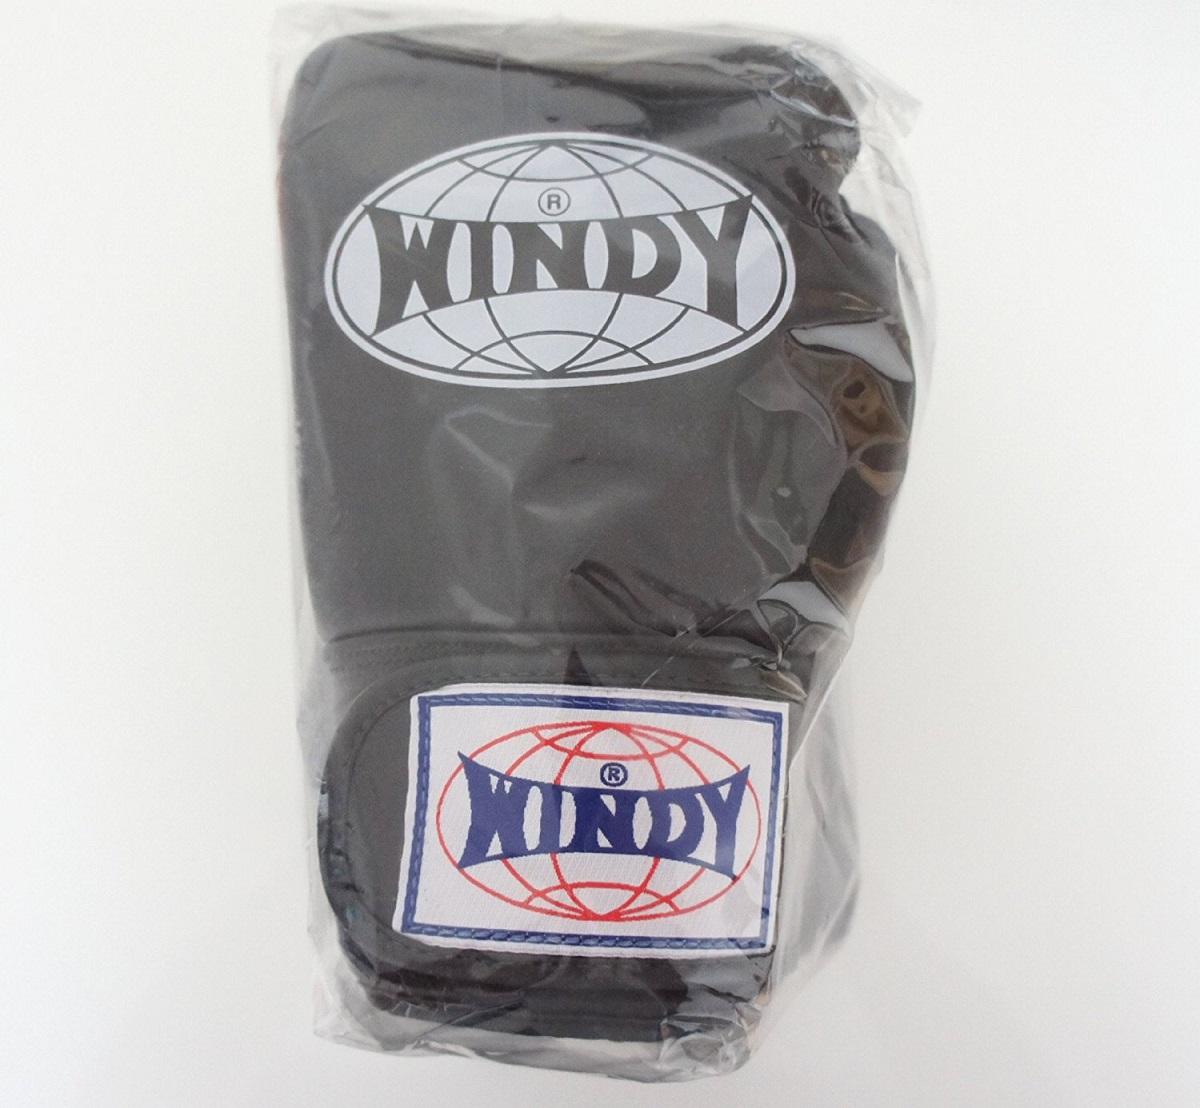 WINDY ウインディ 本革製キックボクシング グローブ 黒 6オンス